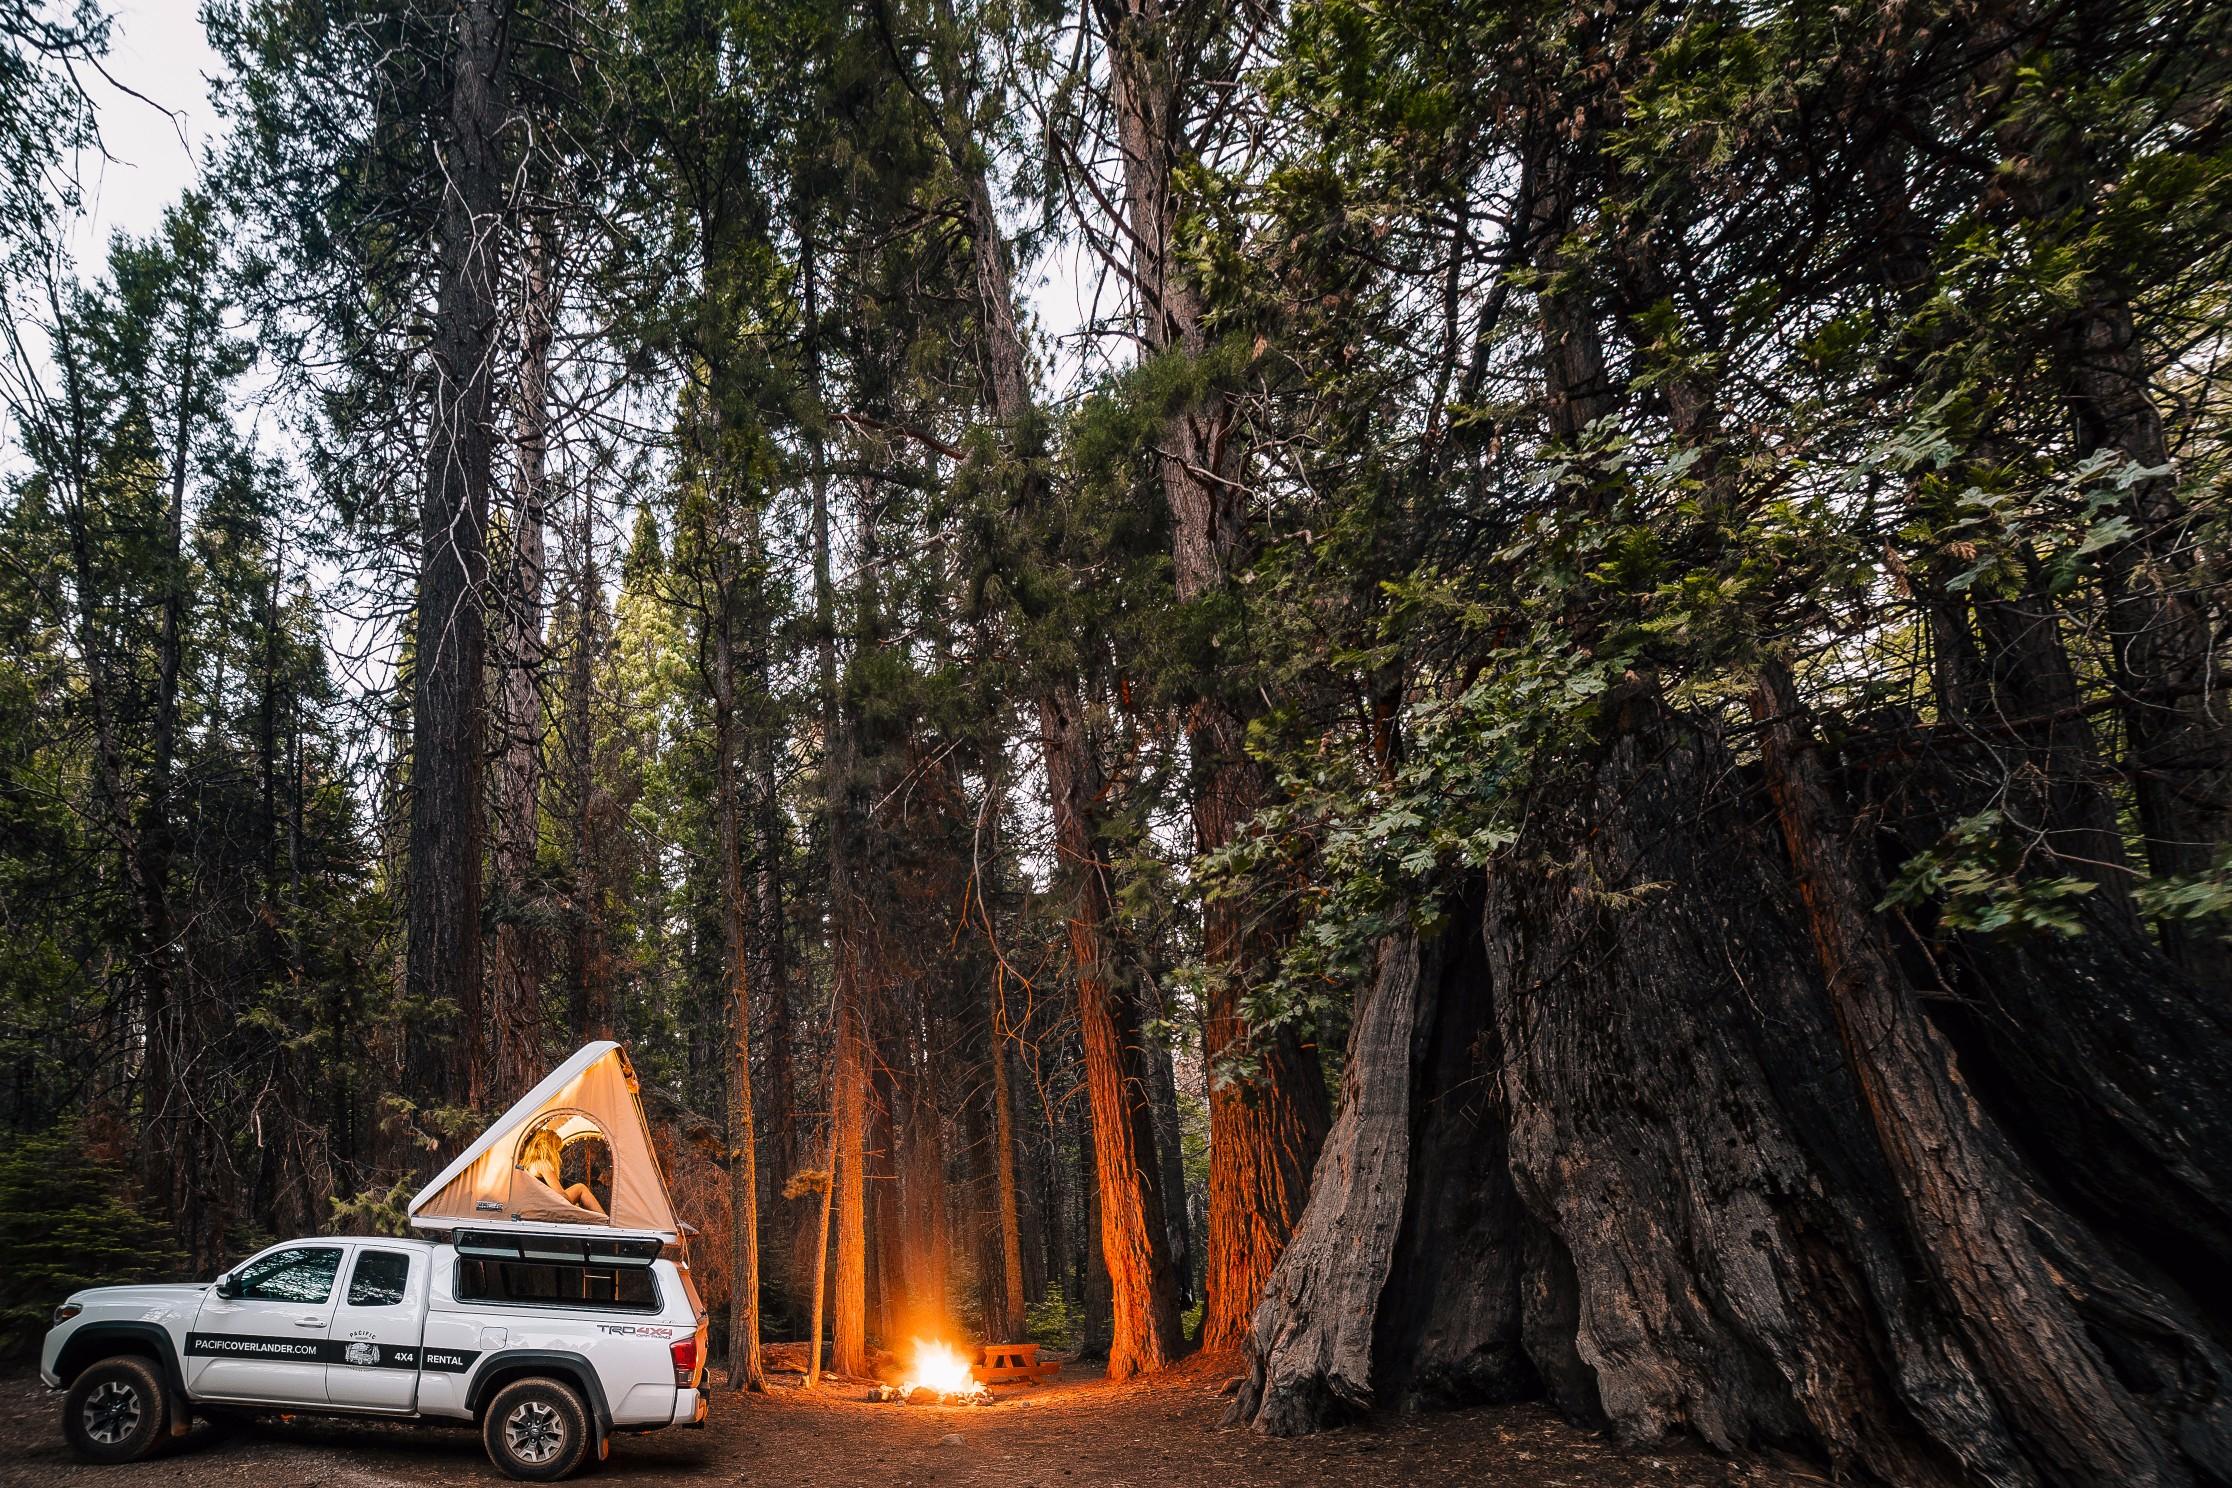 A sequoia tree dwarfs this hideaway campsite deep in the Sierra backcounty. Photo: @francisfaroli